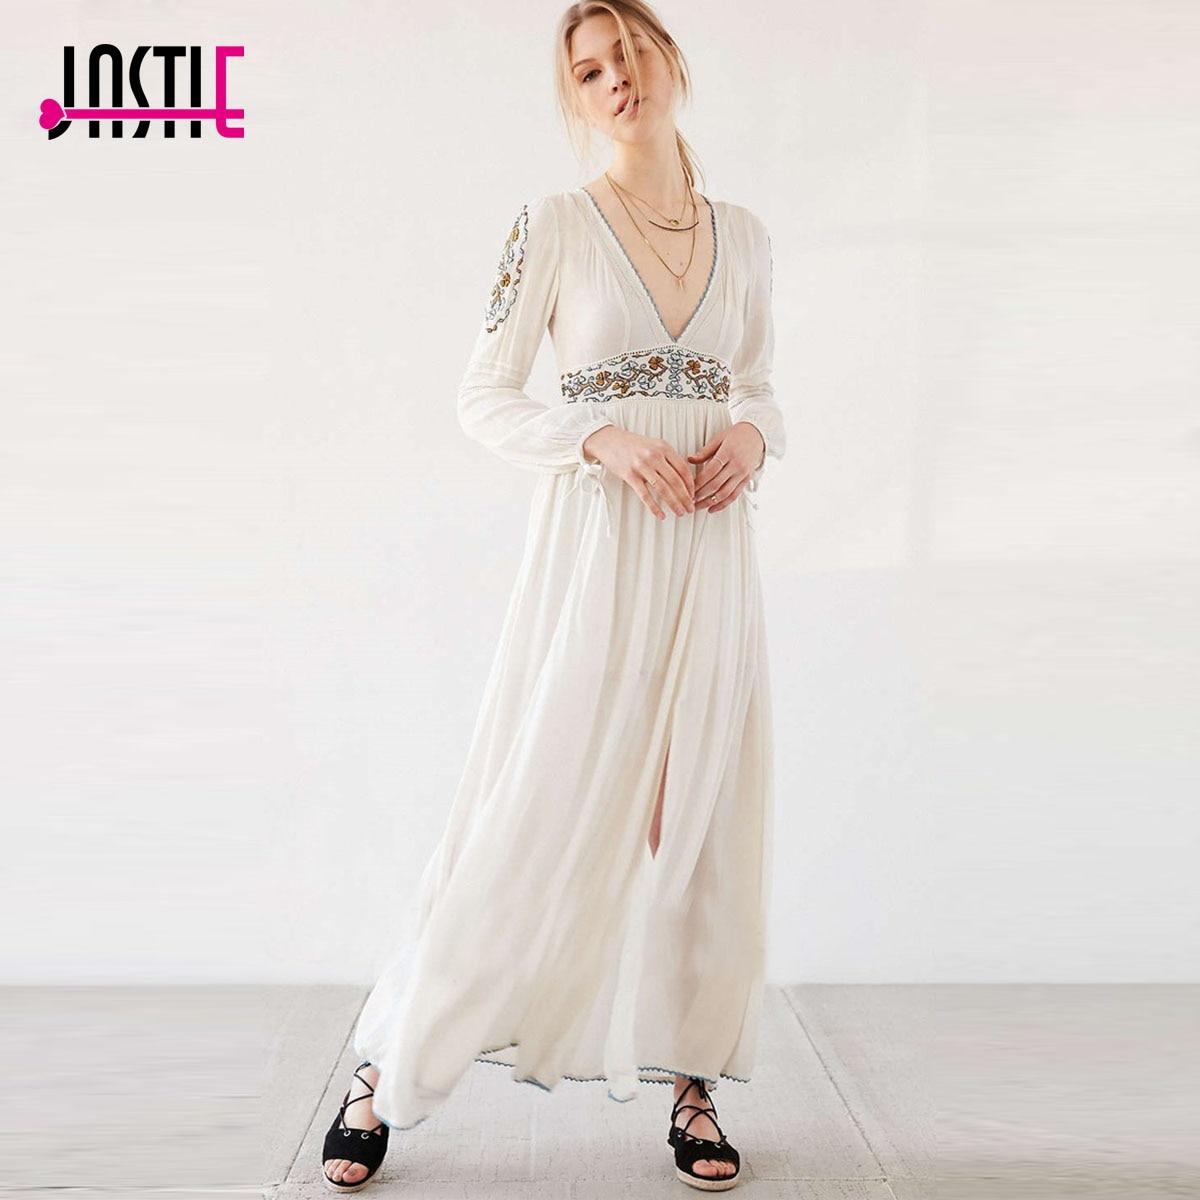 Sexy Party femmes robe Floral broderie Boho robes v-cou ouvert fentes Maxi robe bohème manches longues élégant robes